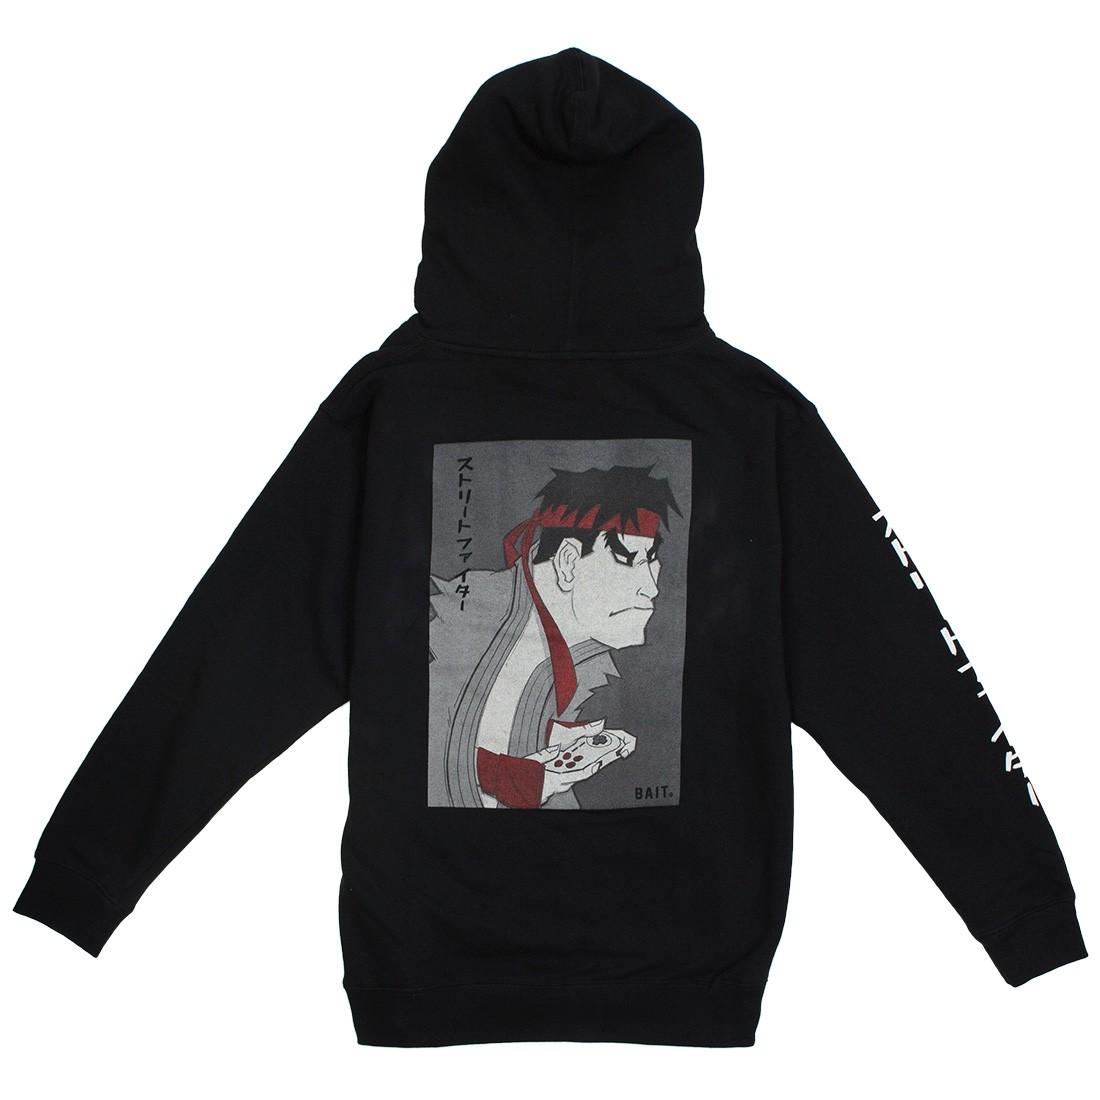 BAIT x Street Fighter x Kidokyo Men Ryu Hoody (black)